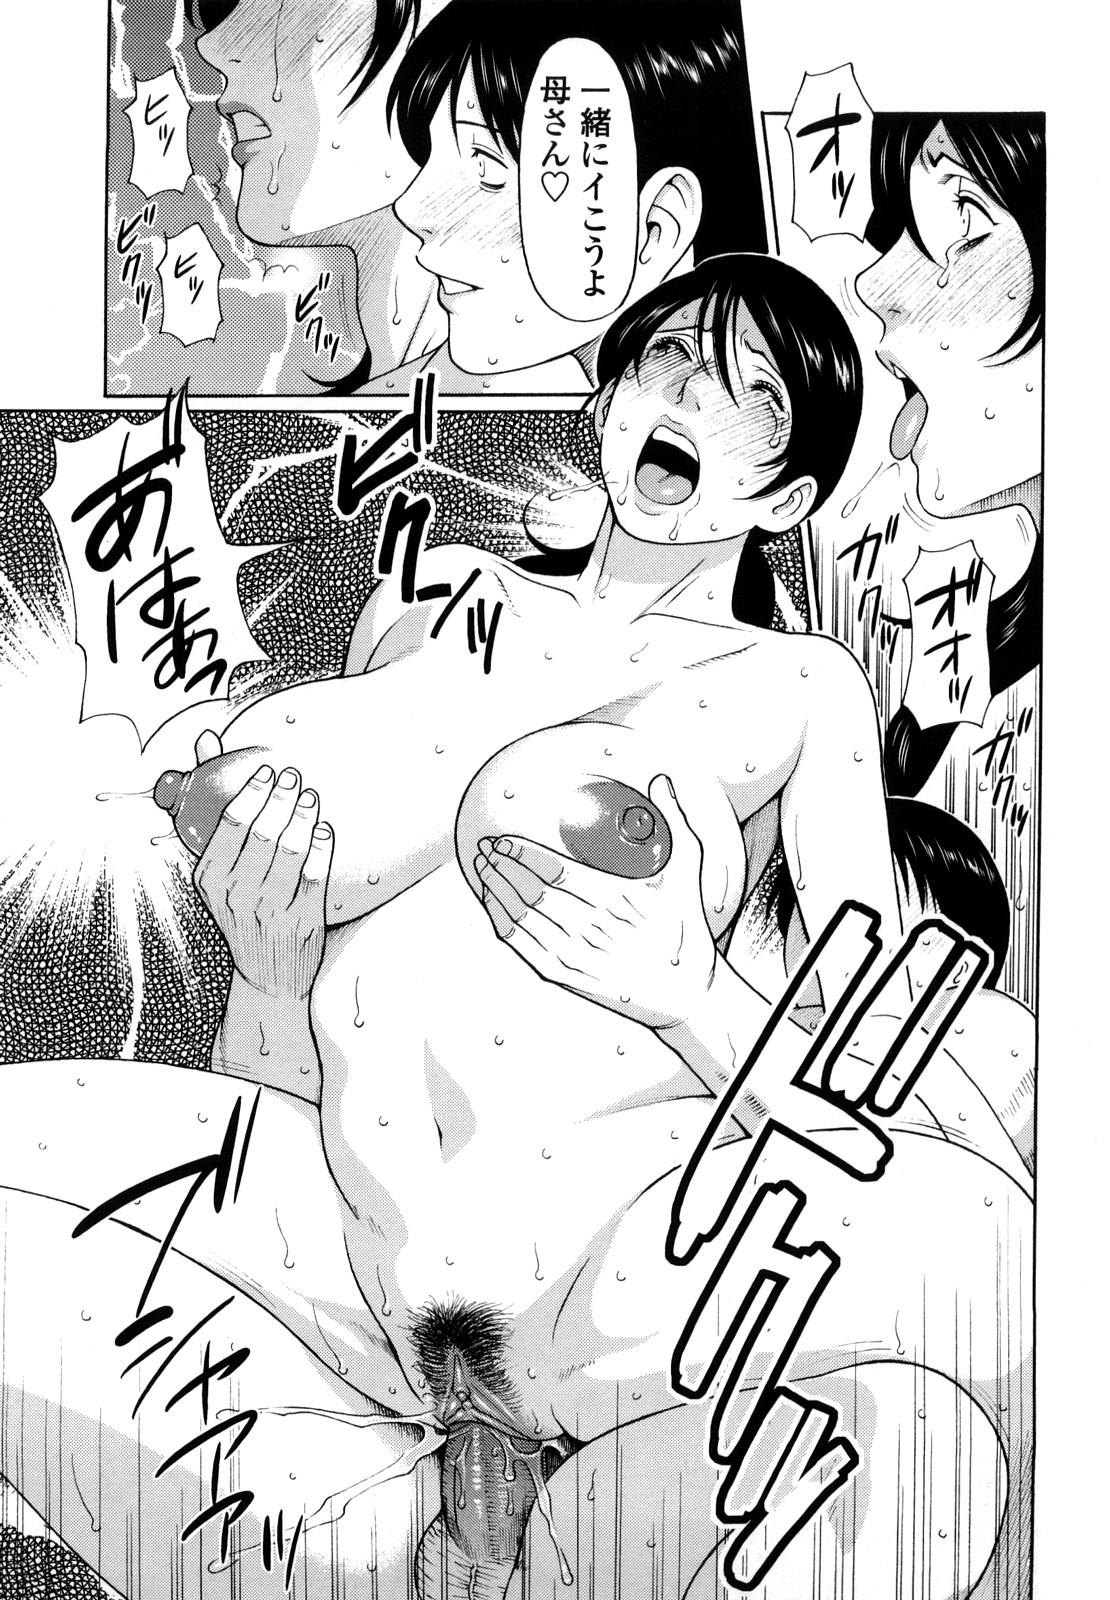 [Takasugi Kou] Kindan no Haha-Ana - Immorality Love-Hole [Decensored] 82